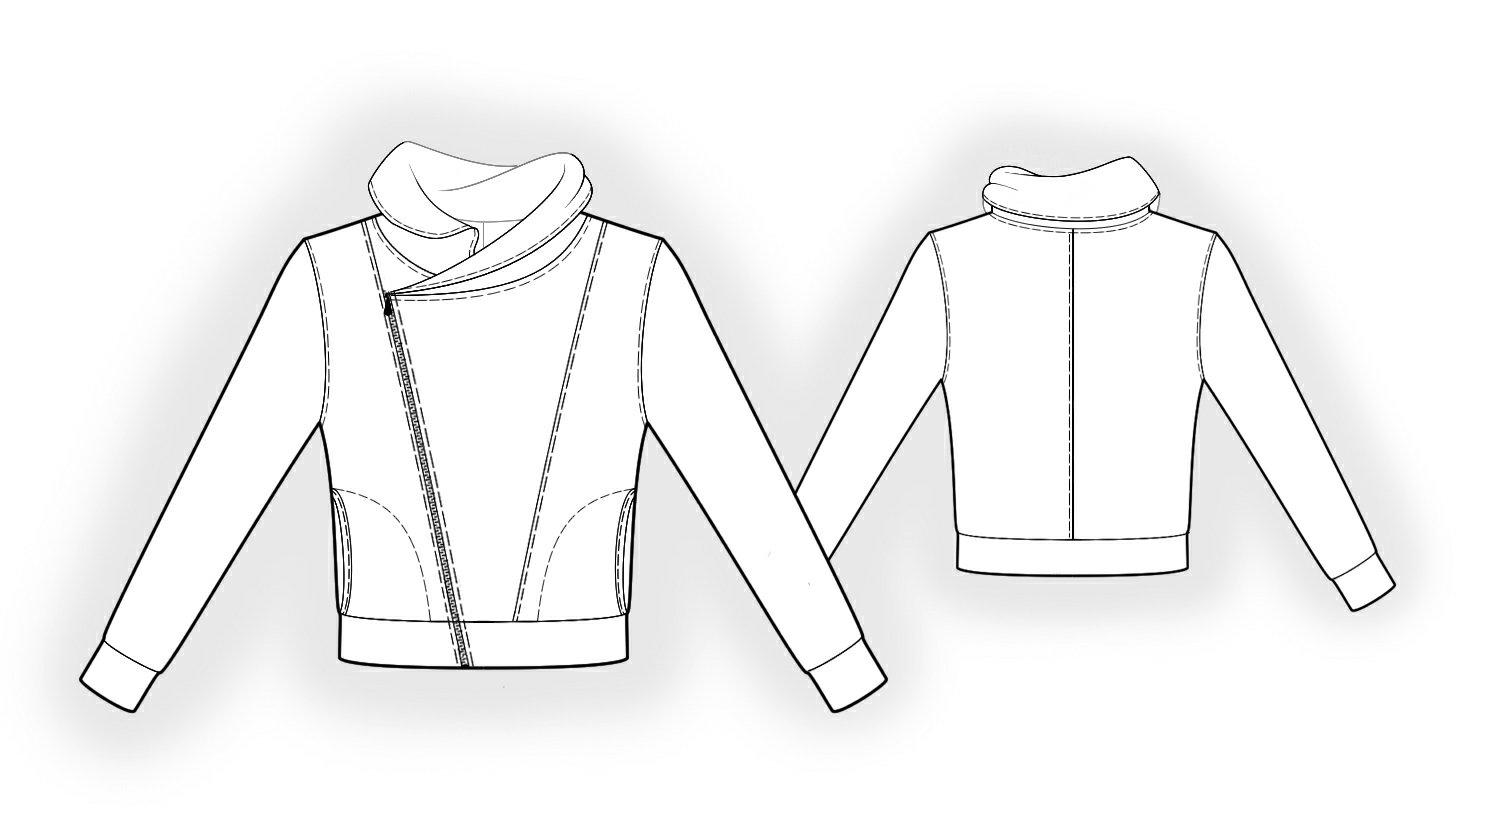 Sweatshirt - Sewing Pattern #6131. Made-to-measure sewing pattern ...